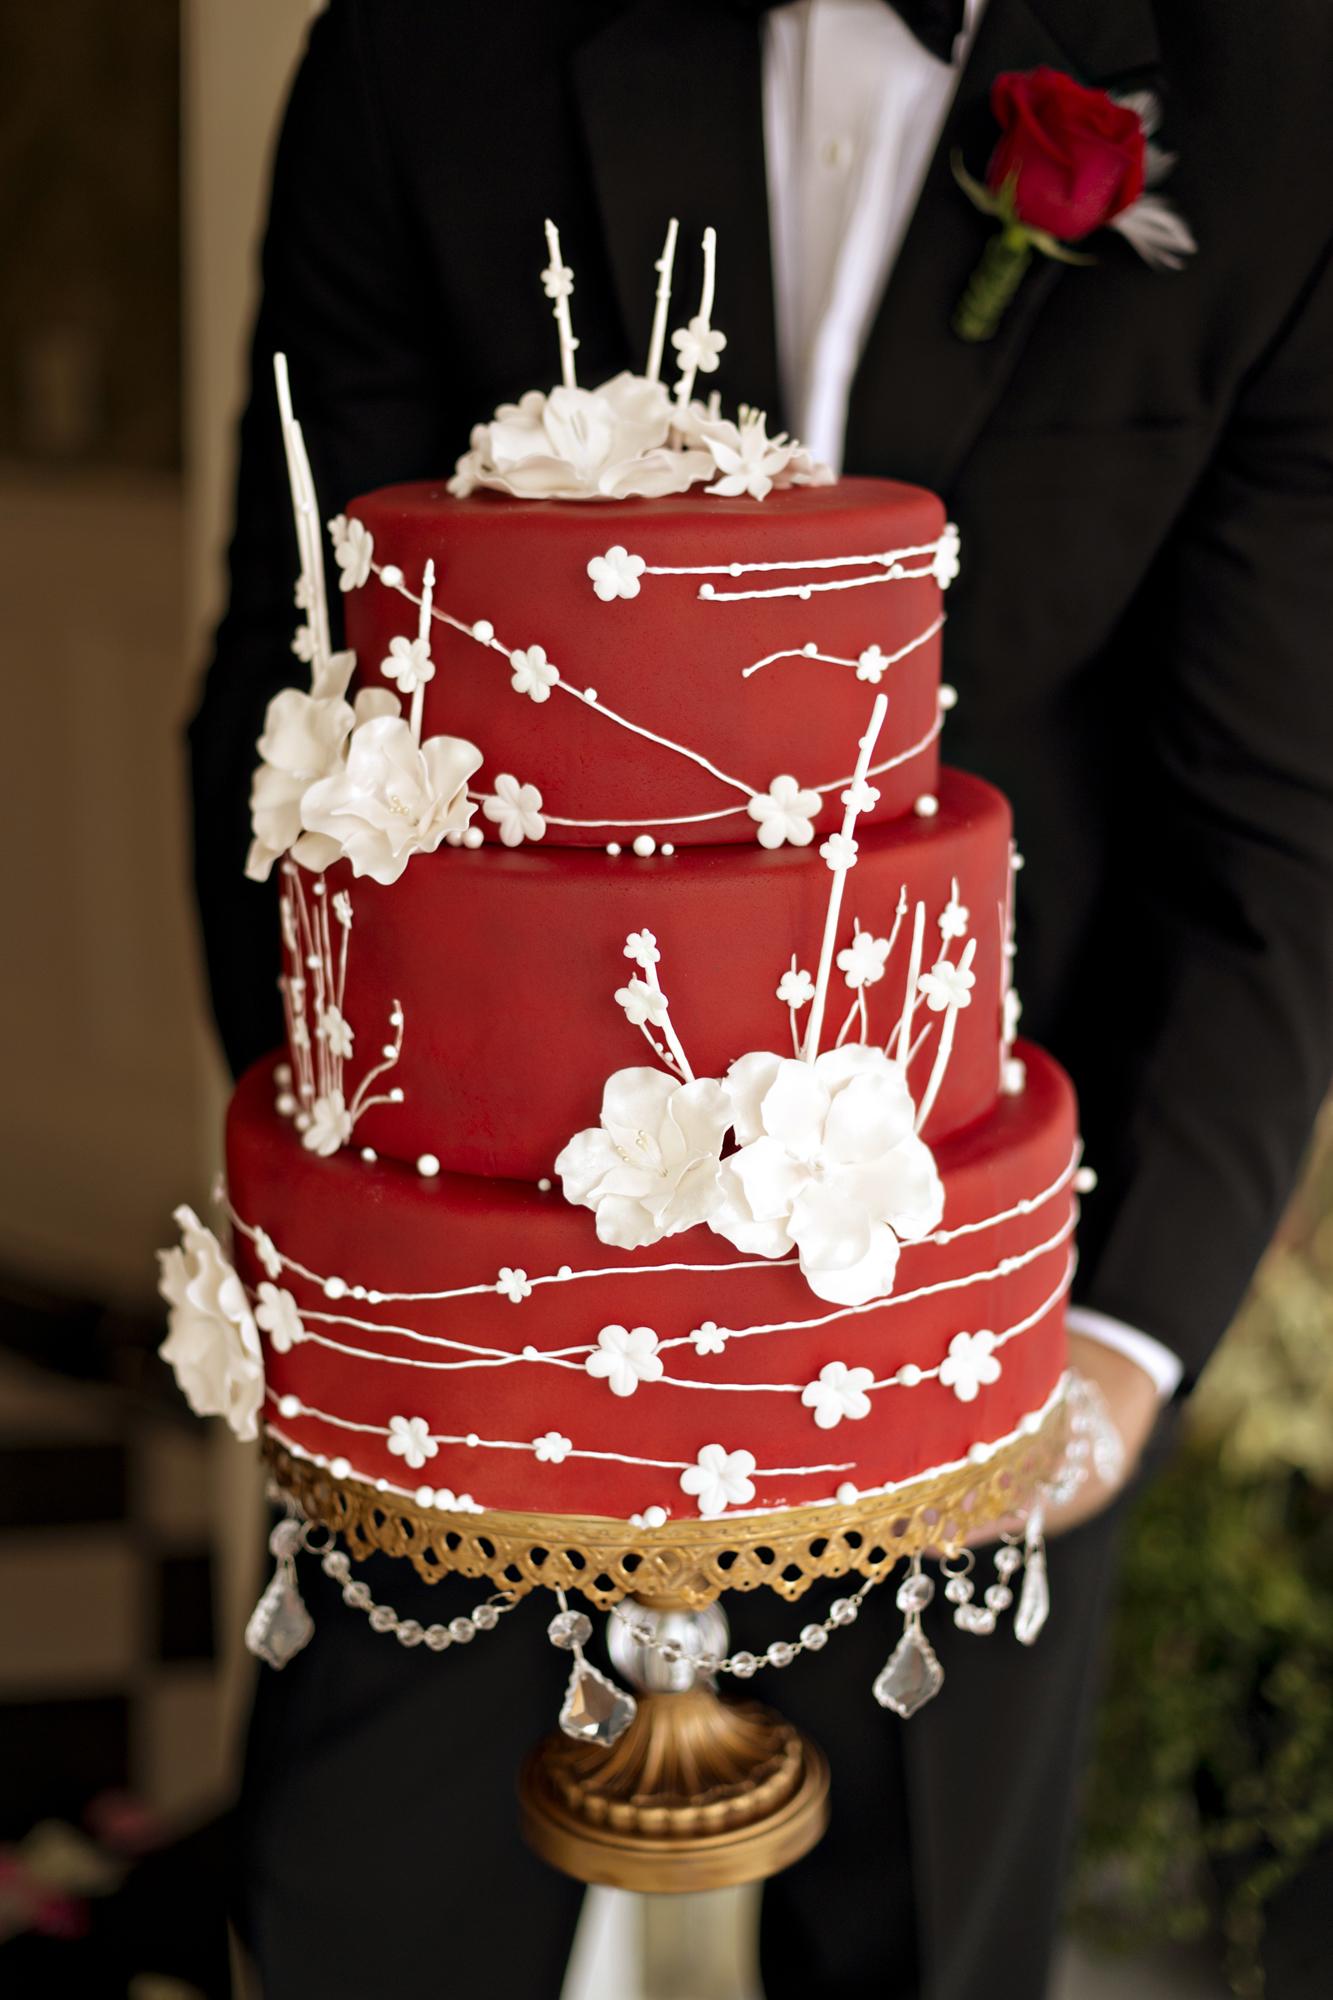 Opulent Treasures Cake Stands Andie Freeman Photo Valentines Day Wedding07.jpg